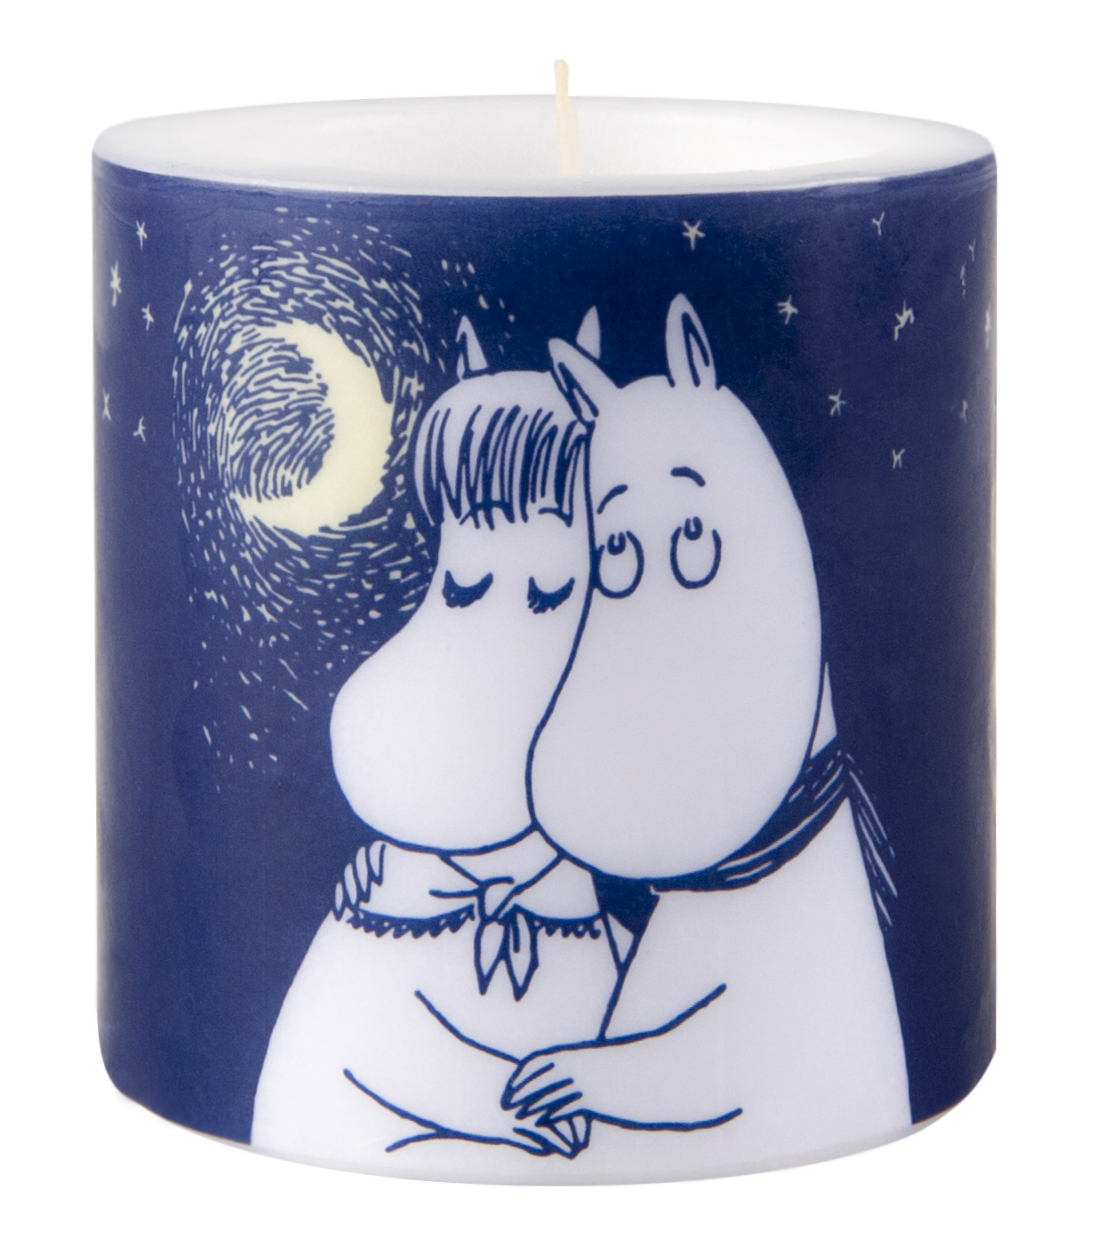 Muurla Moomin Winter Romance candle 8cm